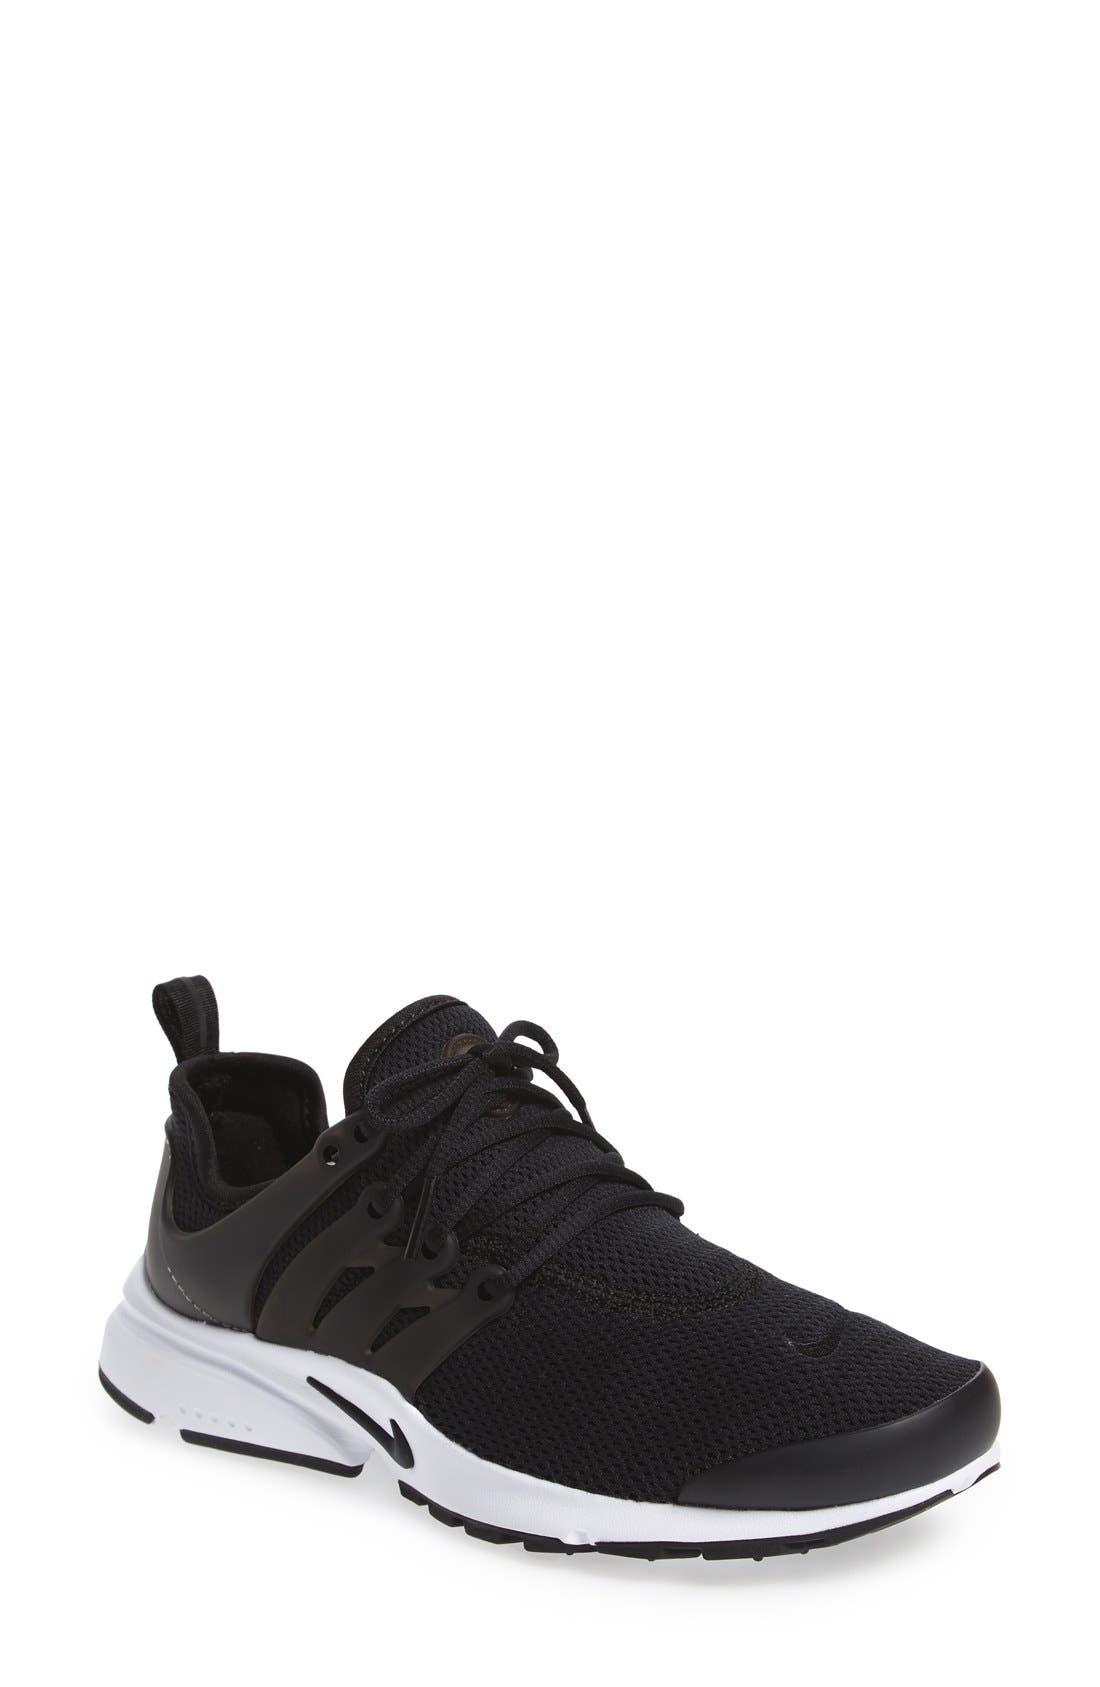 Nike shoe laces black and white dresses